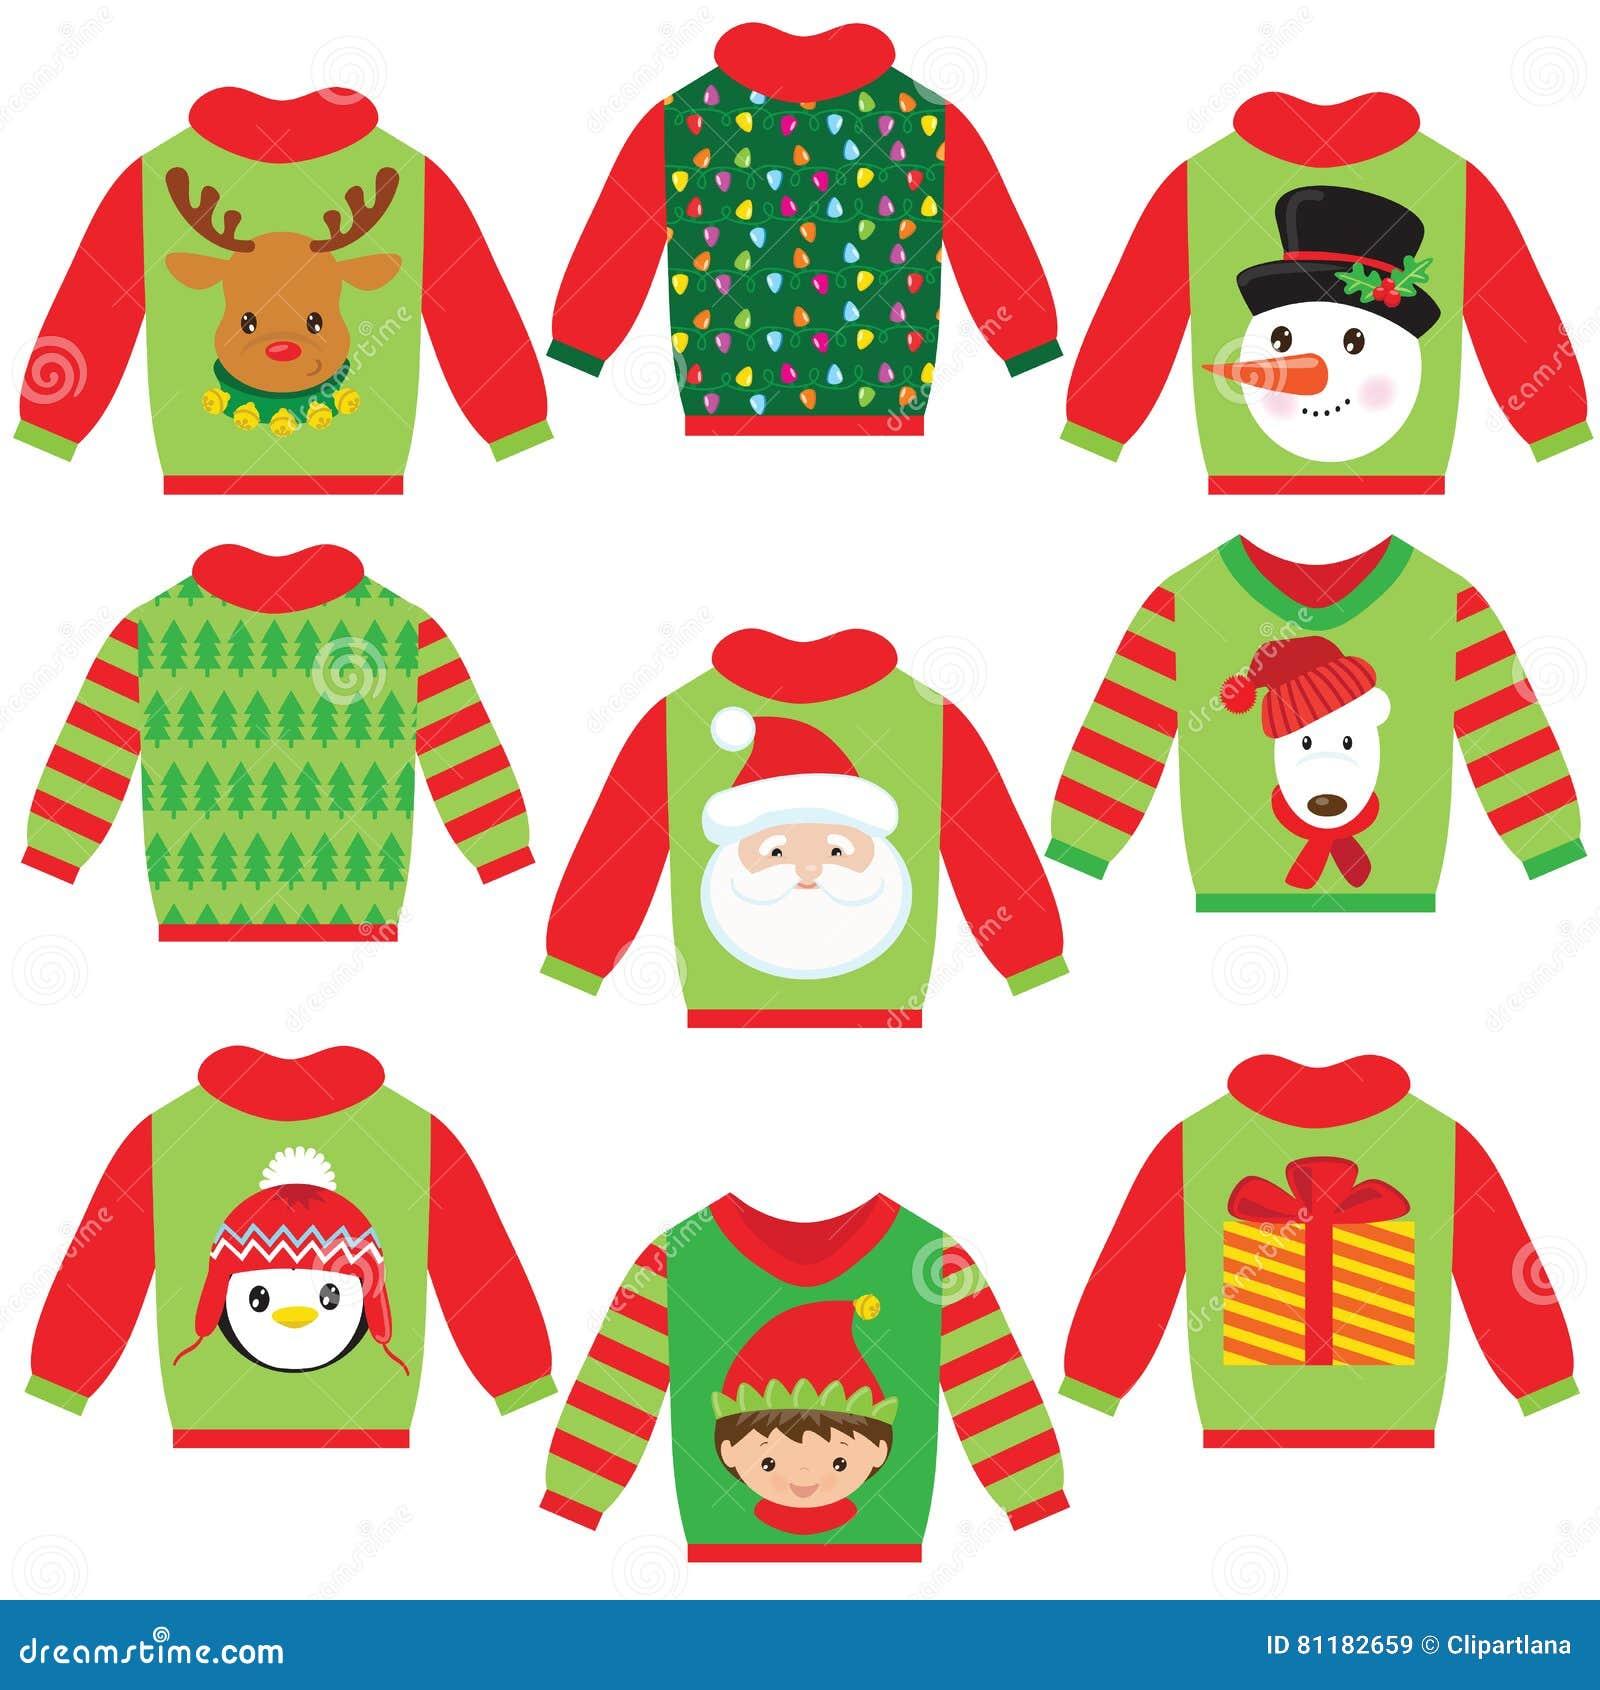 Cute Christmas Sweater Vector Illustration Stock Vector ...